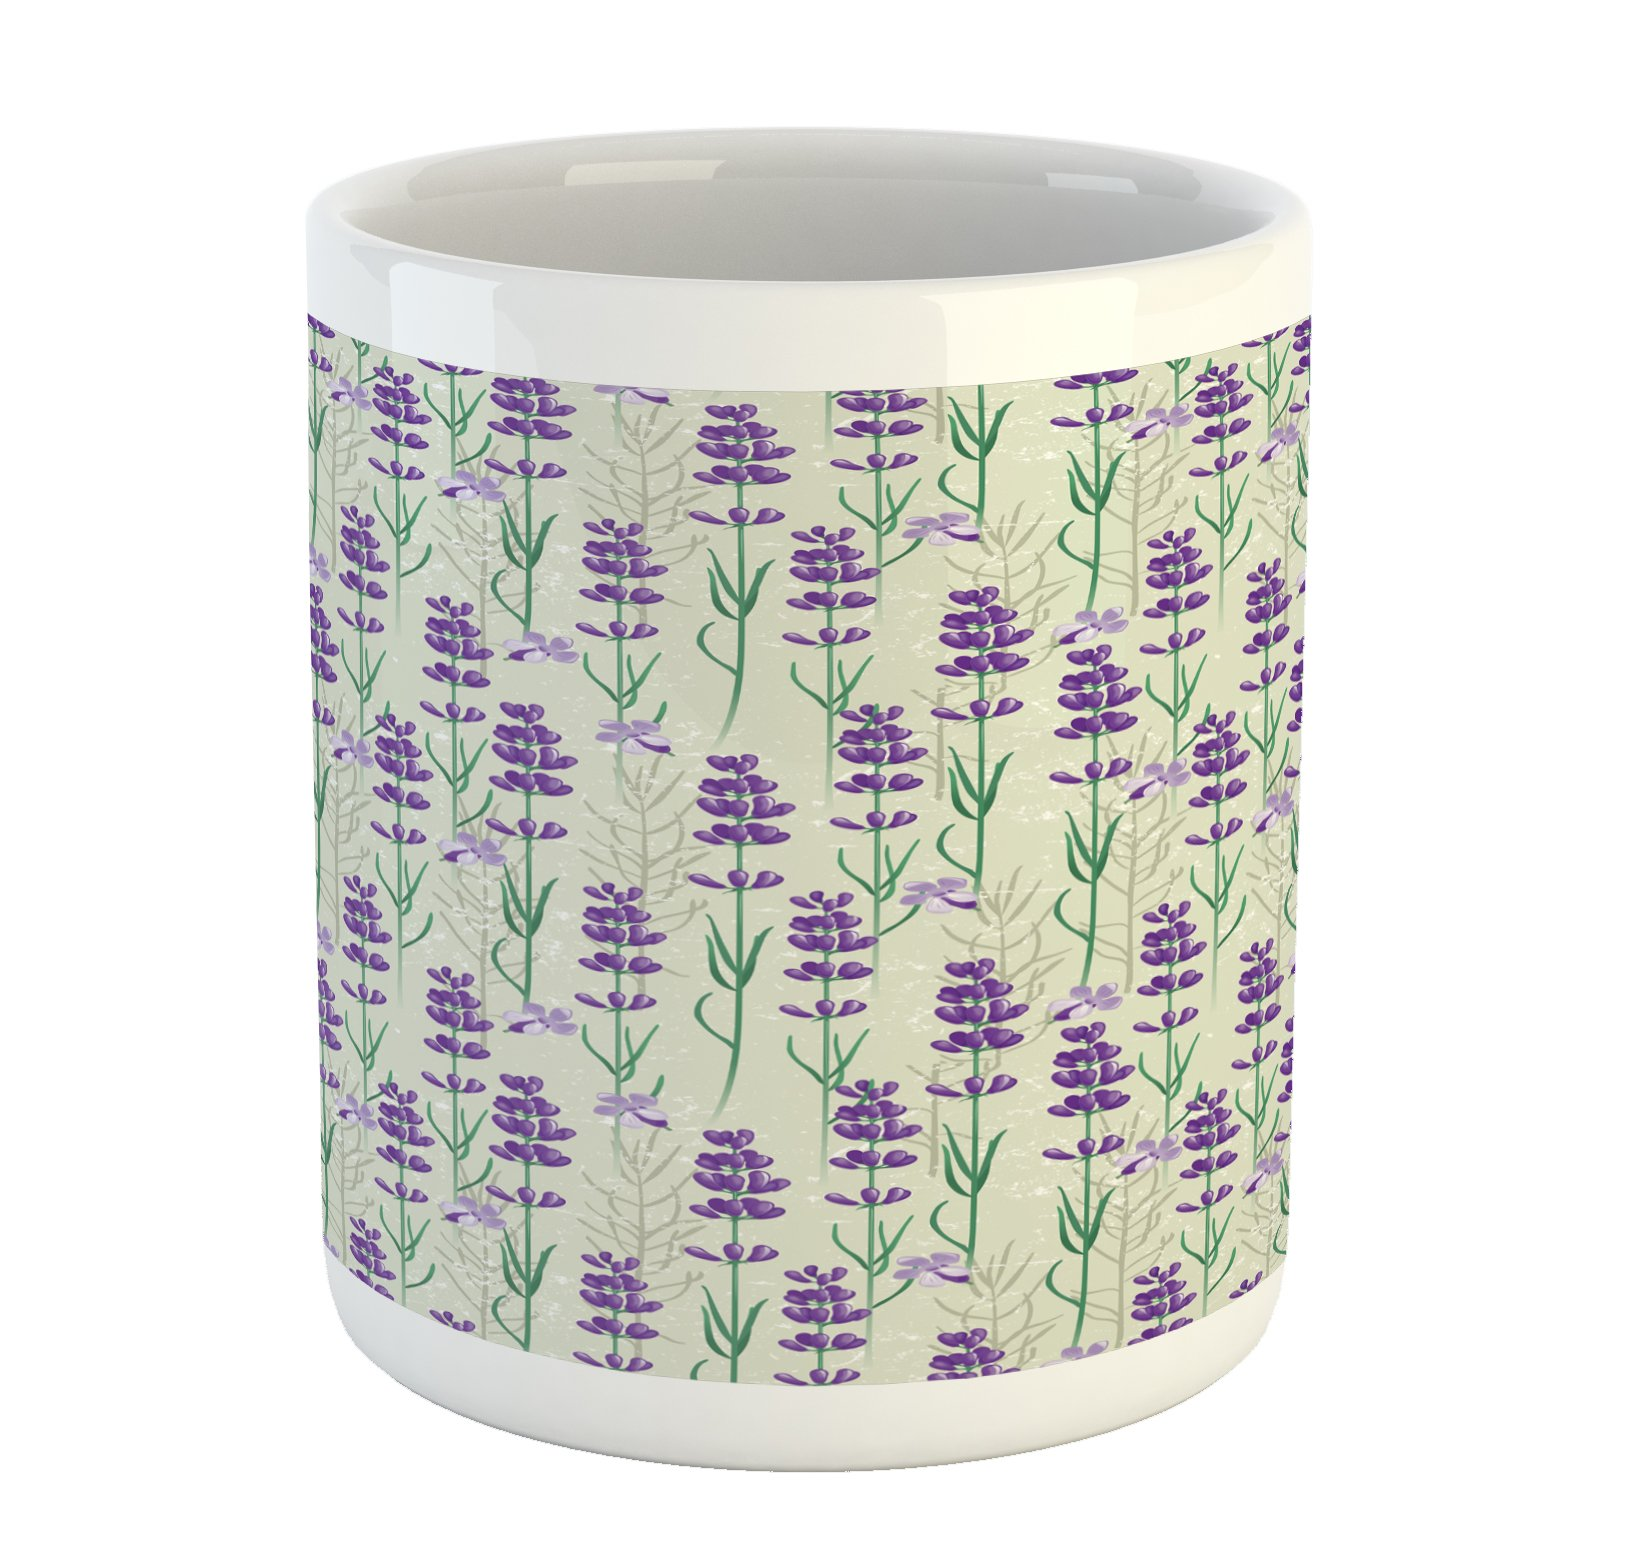 Ambesonne Lavender Mug, Botanical Pattern with Fresh Herbs Aromatherapy Spa Theme, Printed Ceramic Coffee Mug Water Tea Drinks Cup, Pale Sage Green Violet and Green